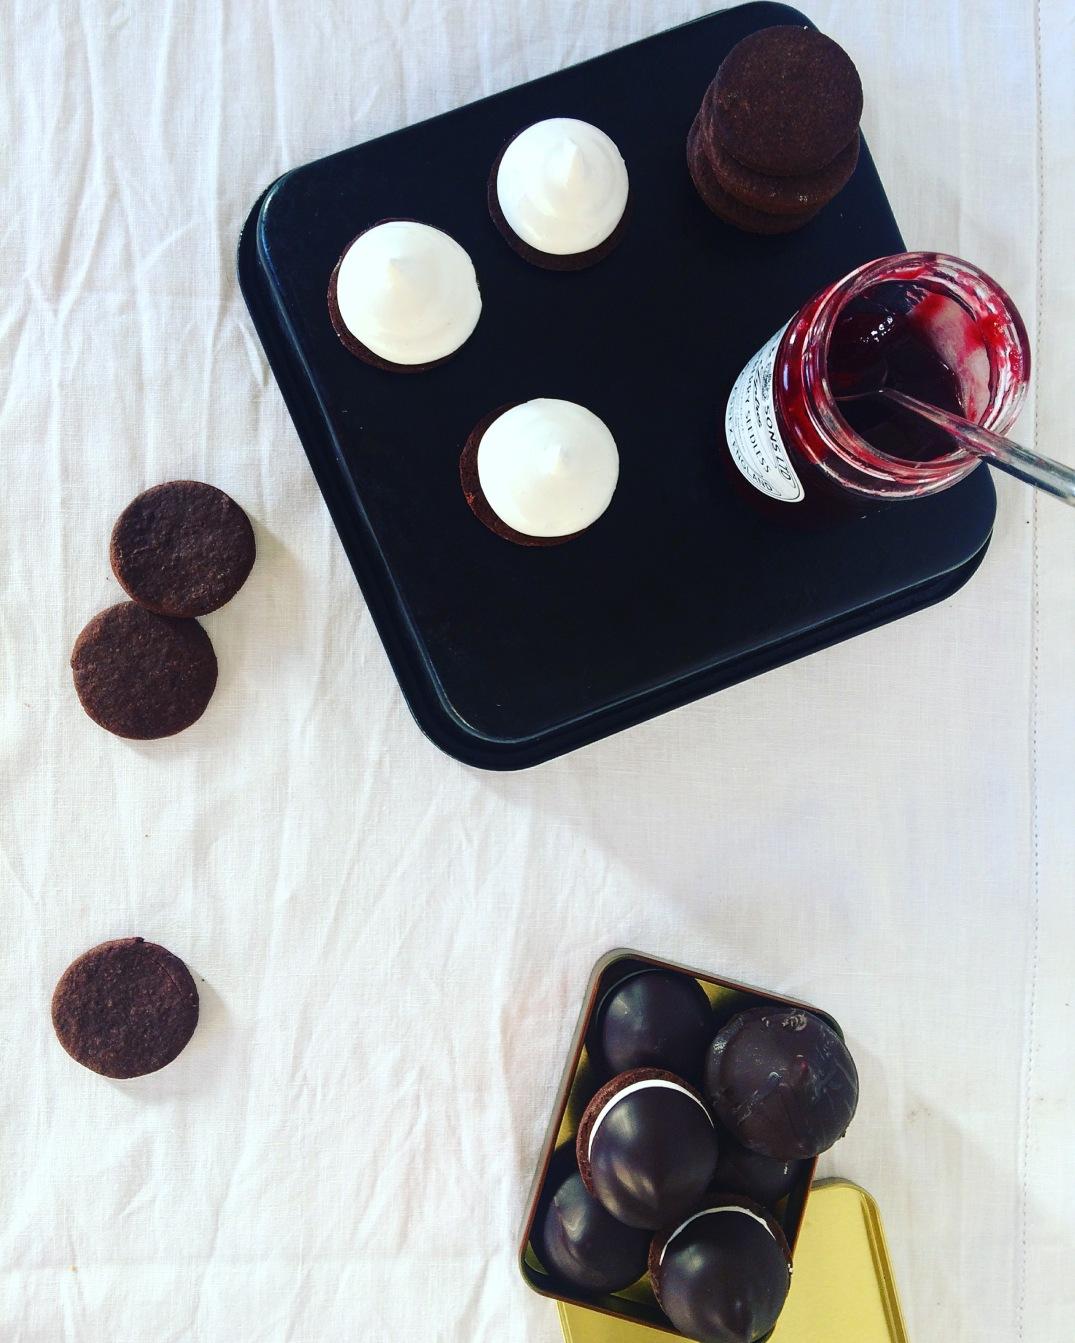 Chocolate Marshmallow Teacakes with raspberry jam - Sky Meadow Bakery blog